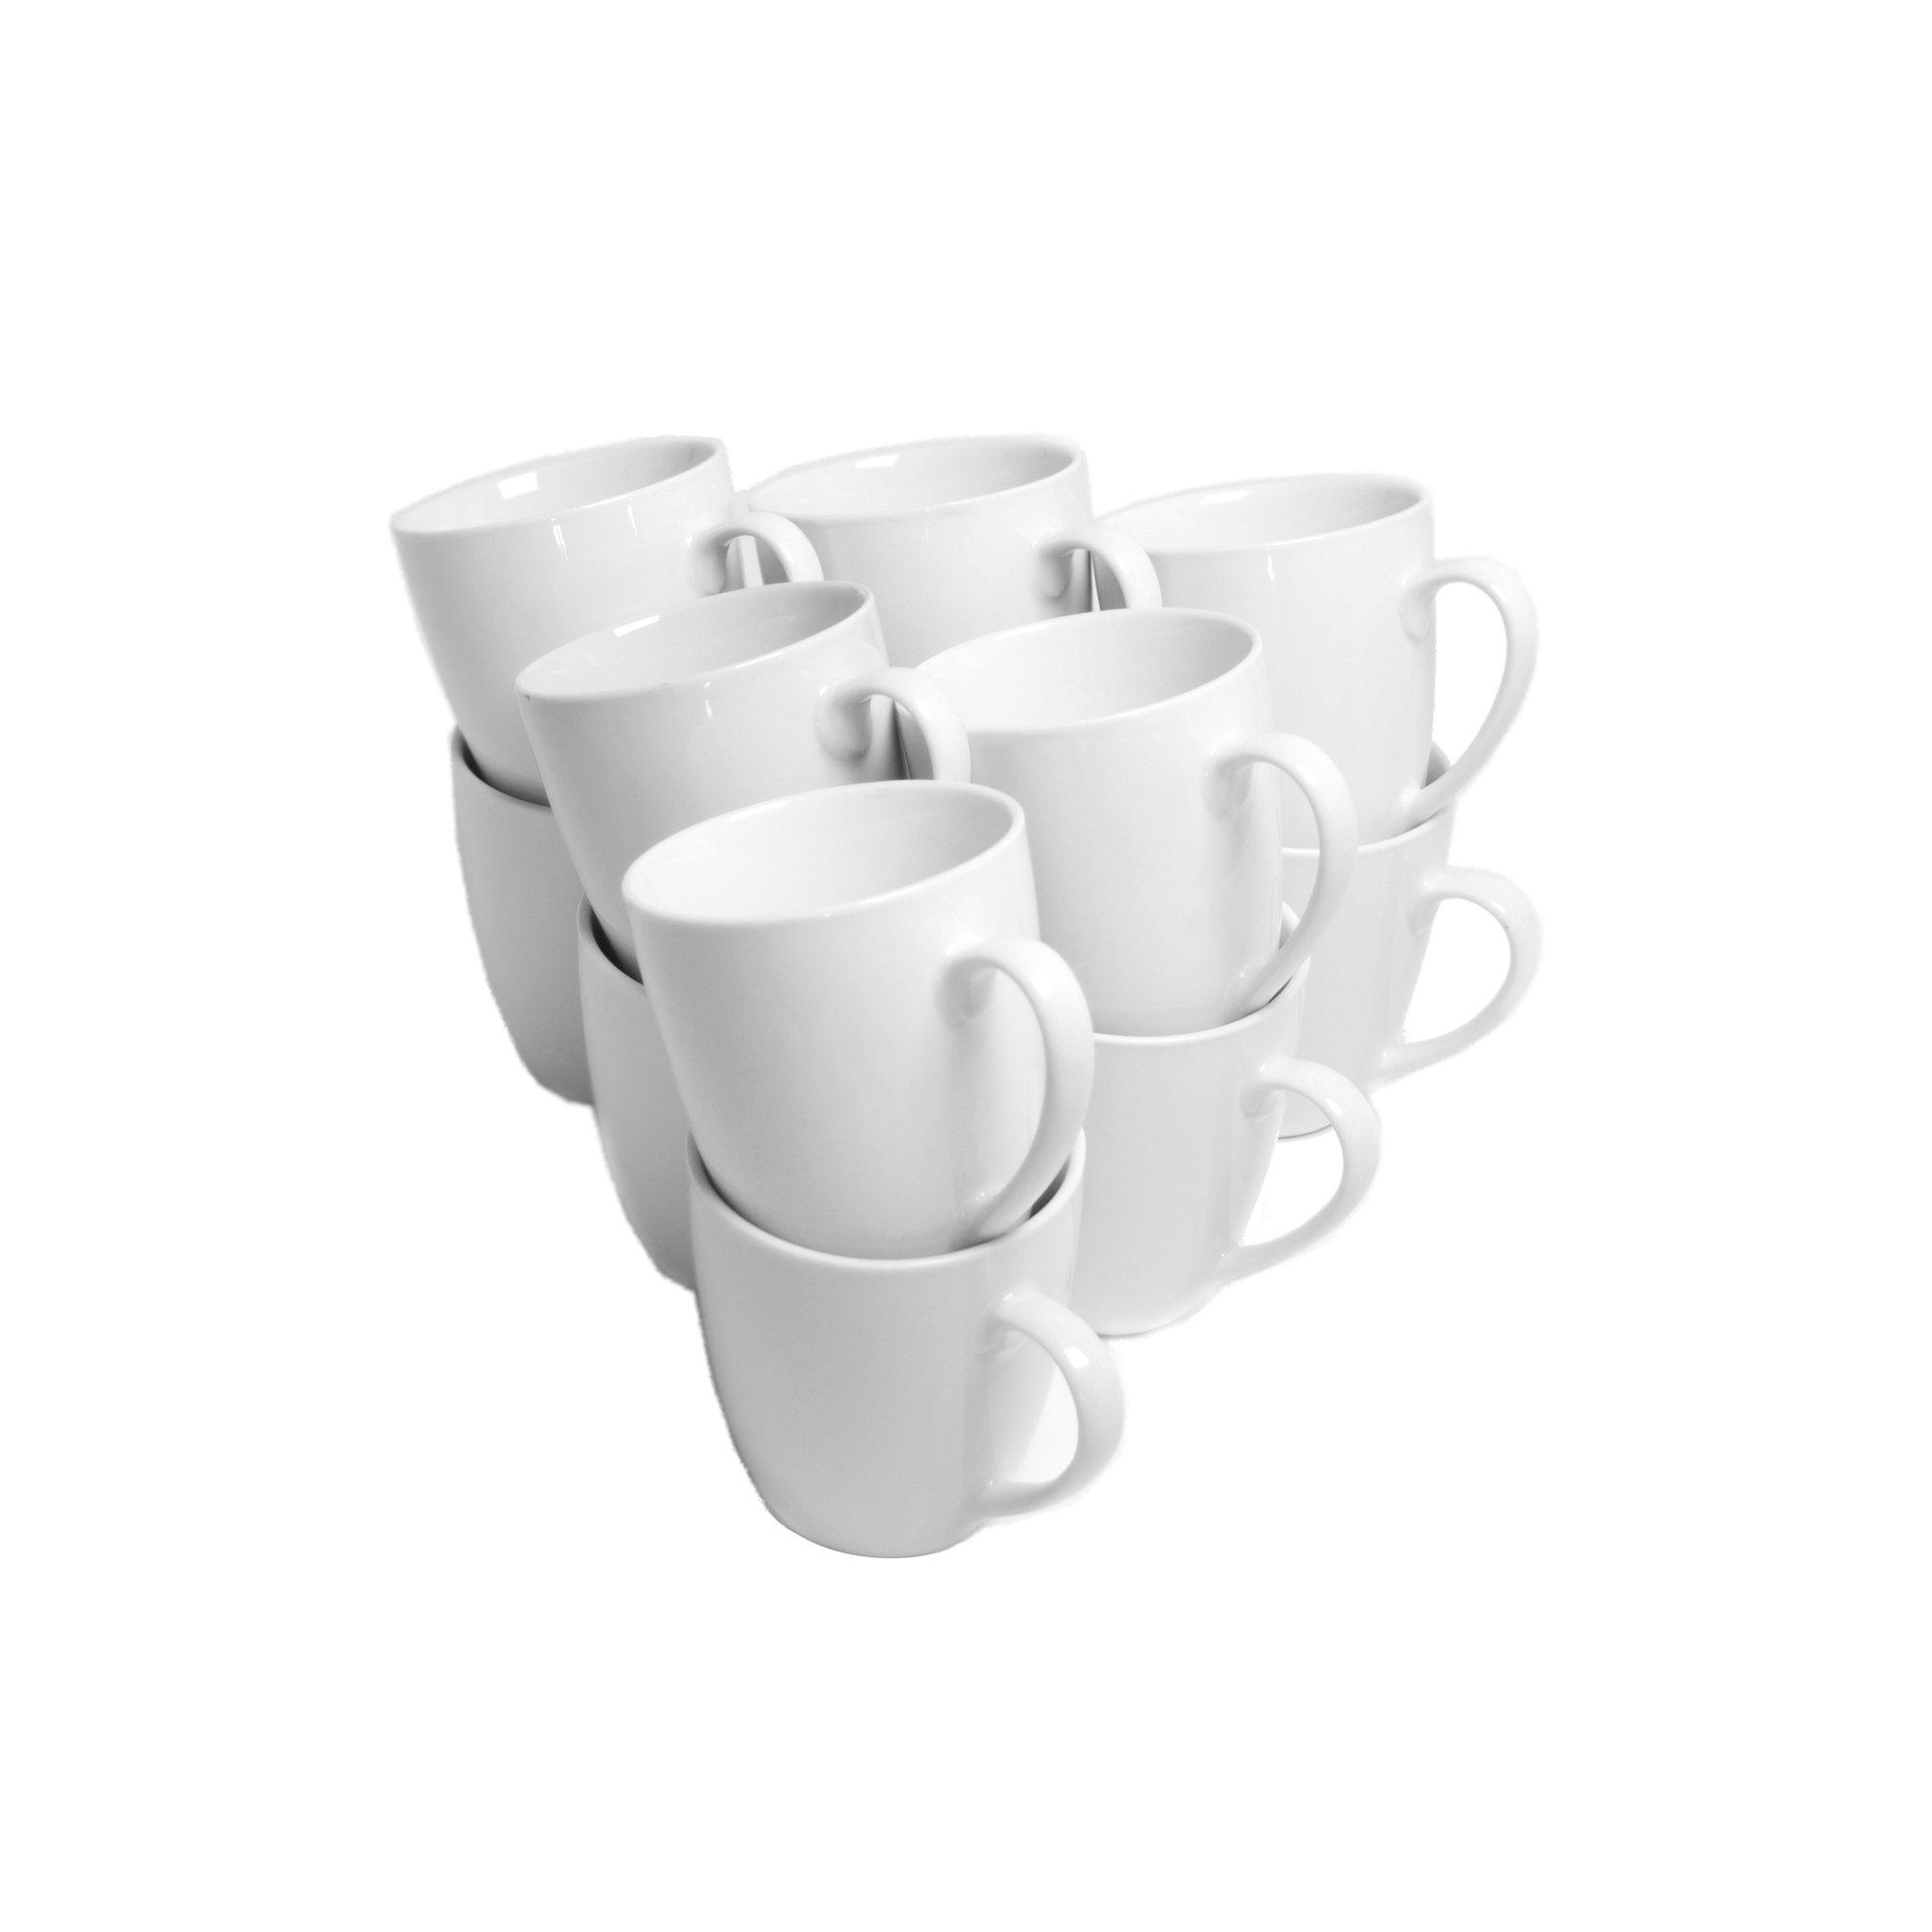 10 Strawberry Street CATERING-12-MUG-W Catering Mug Set, White by 10 Strawberry Street